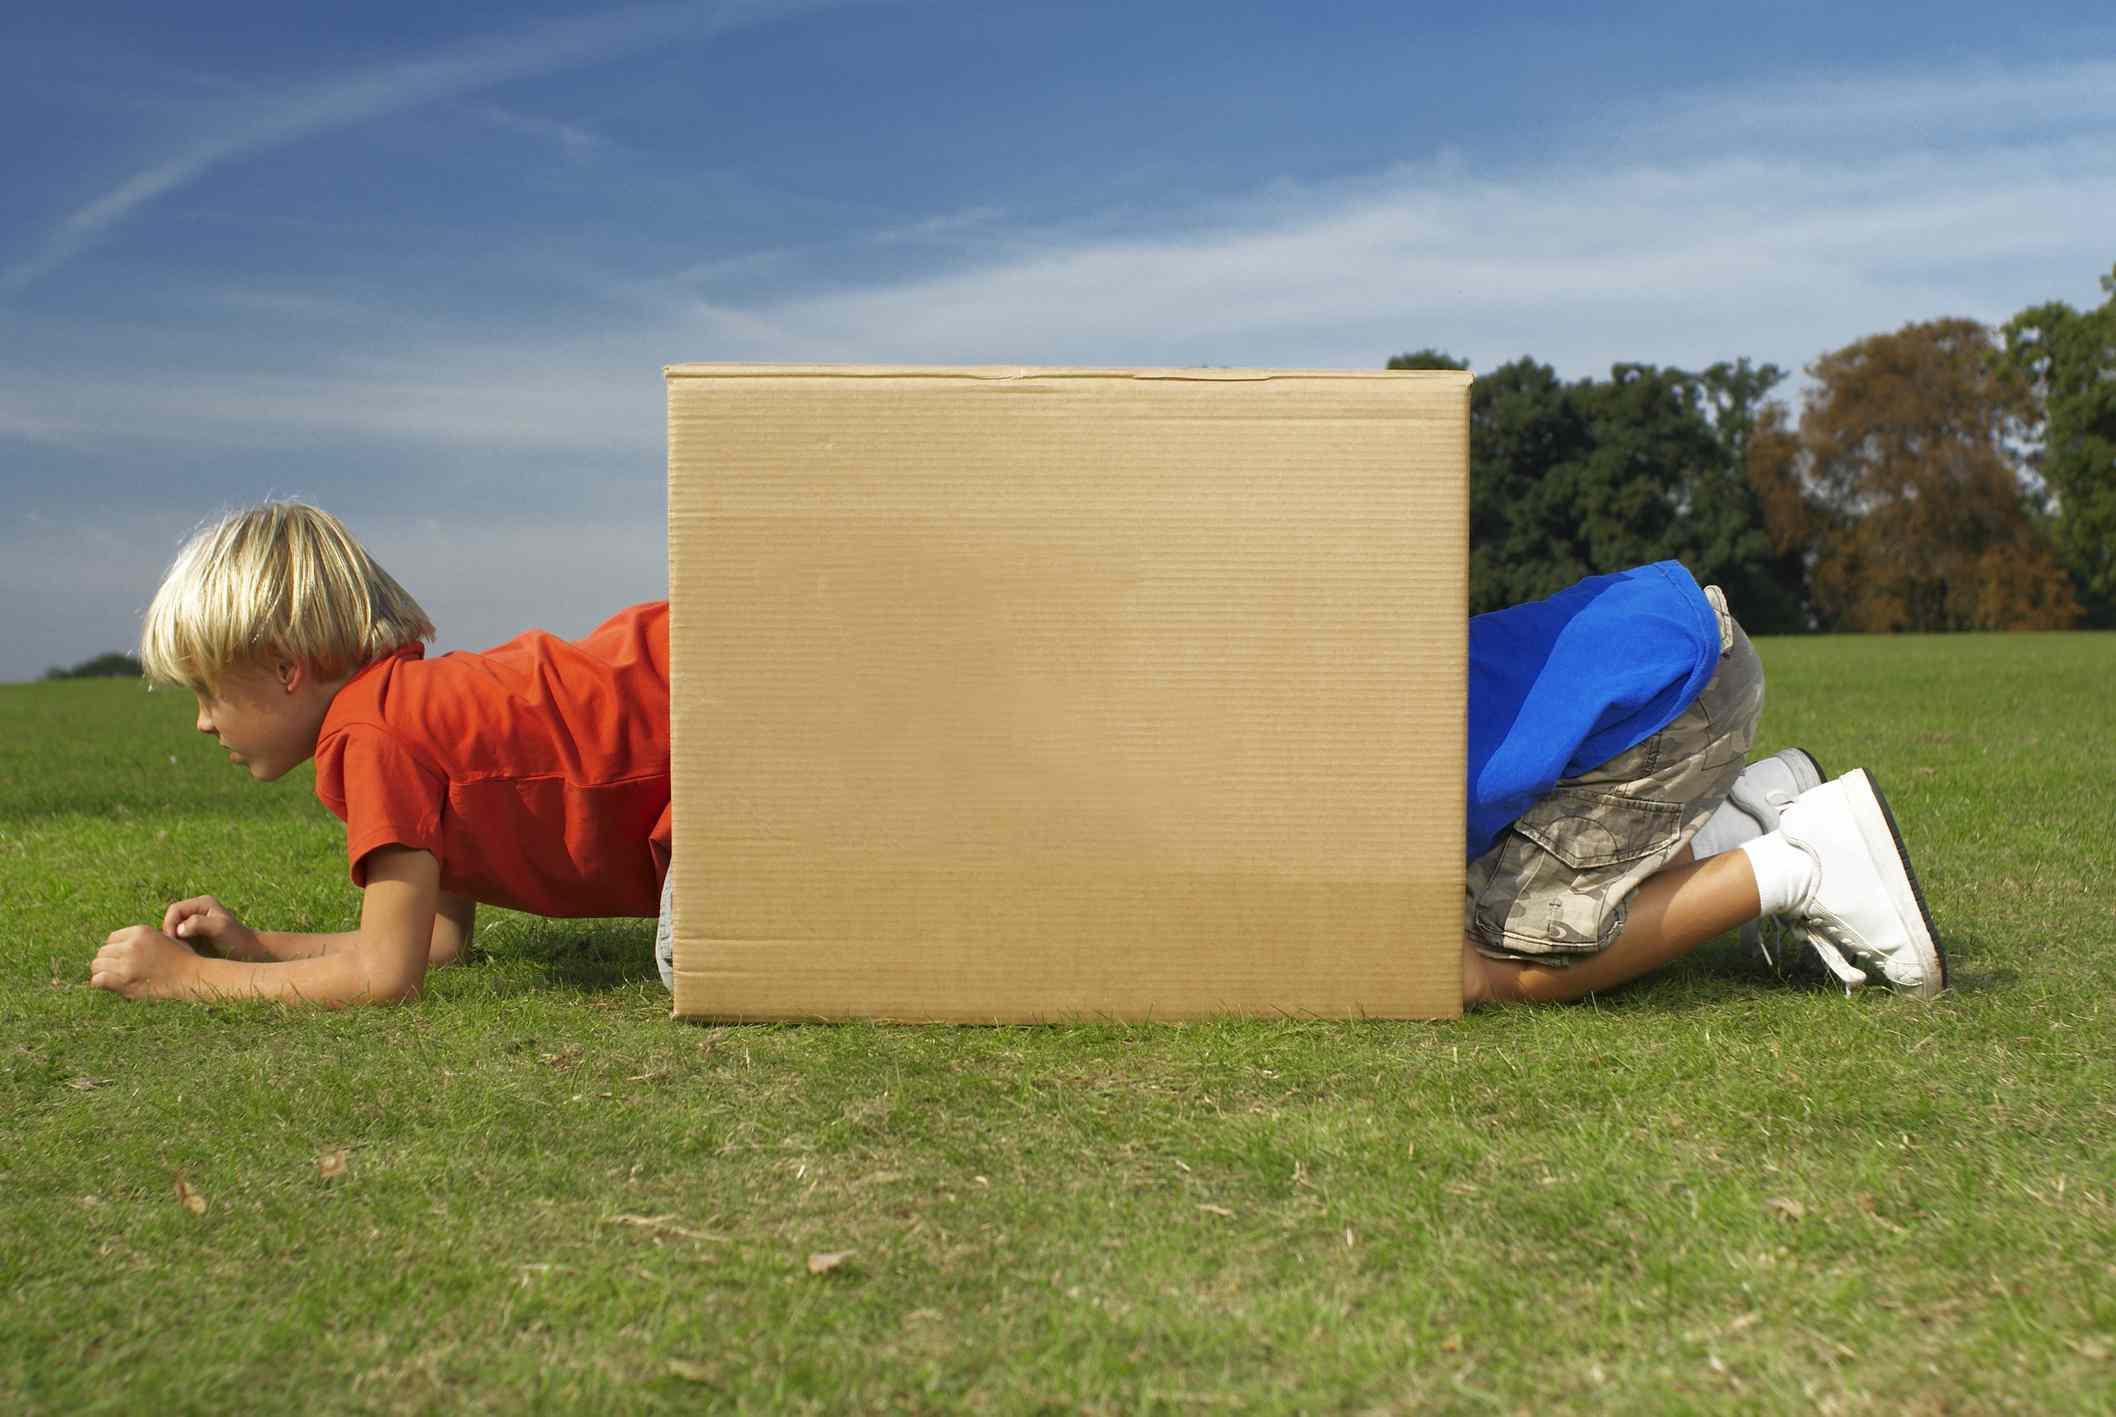 Two kids crawling through a cardboard box